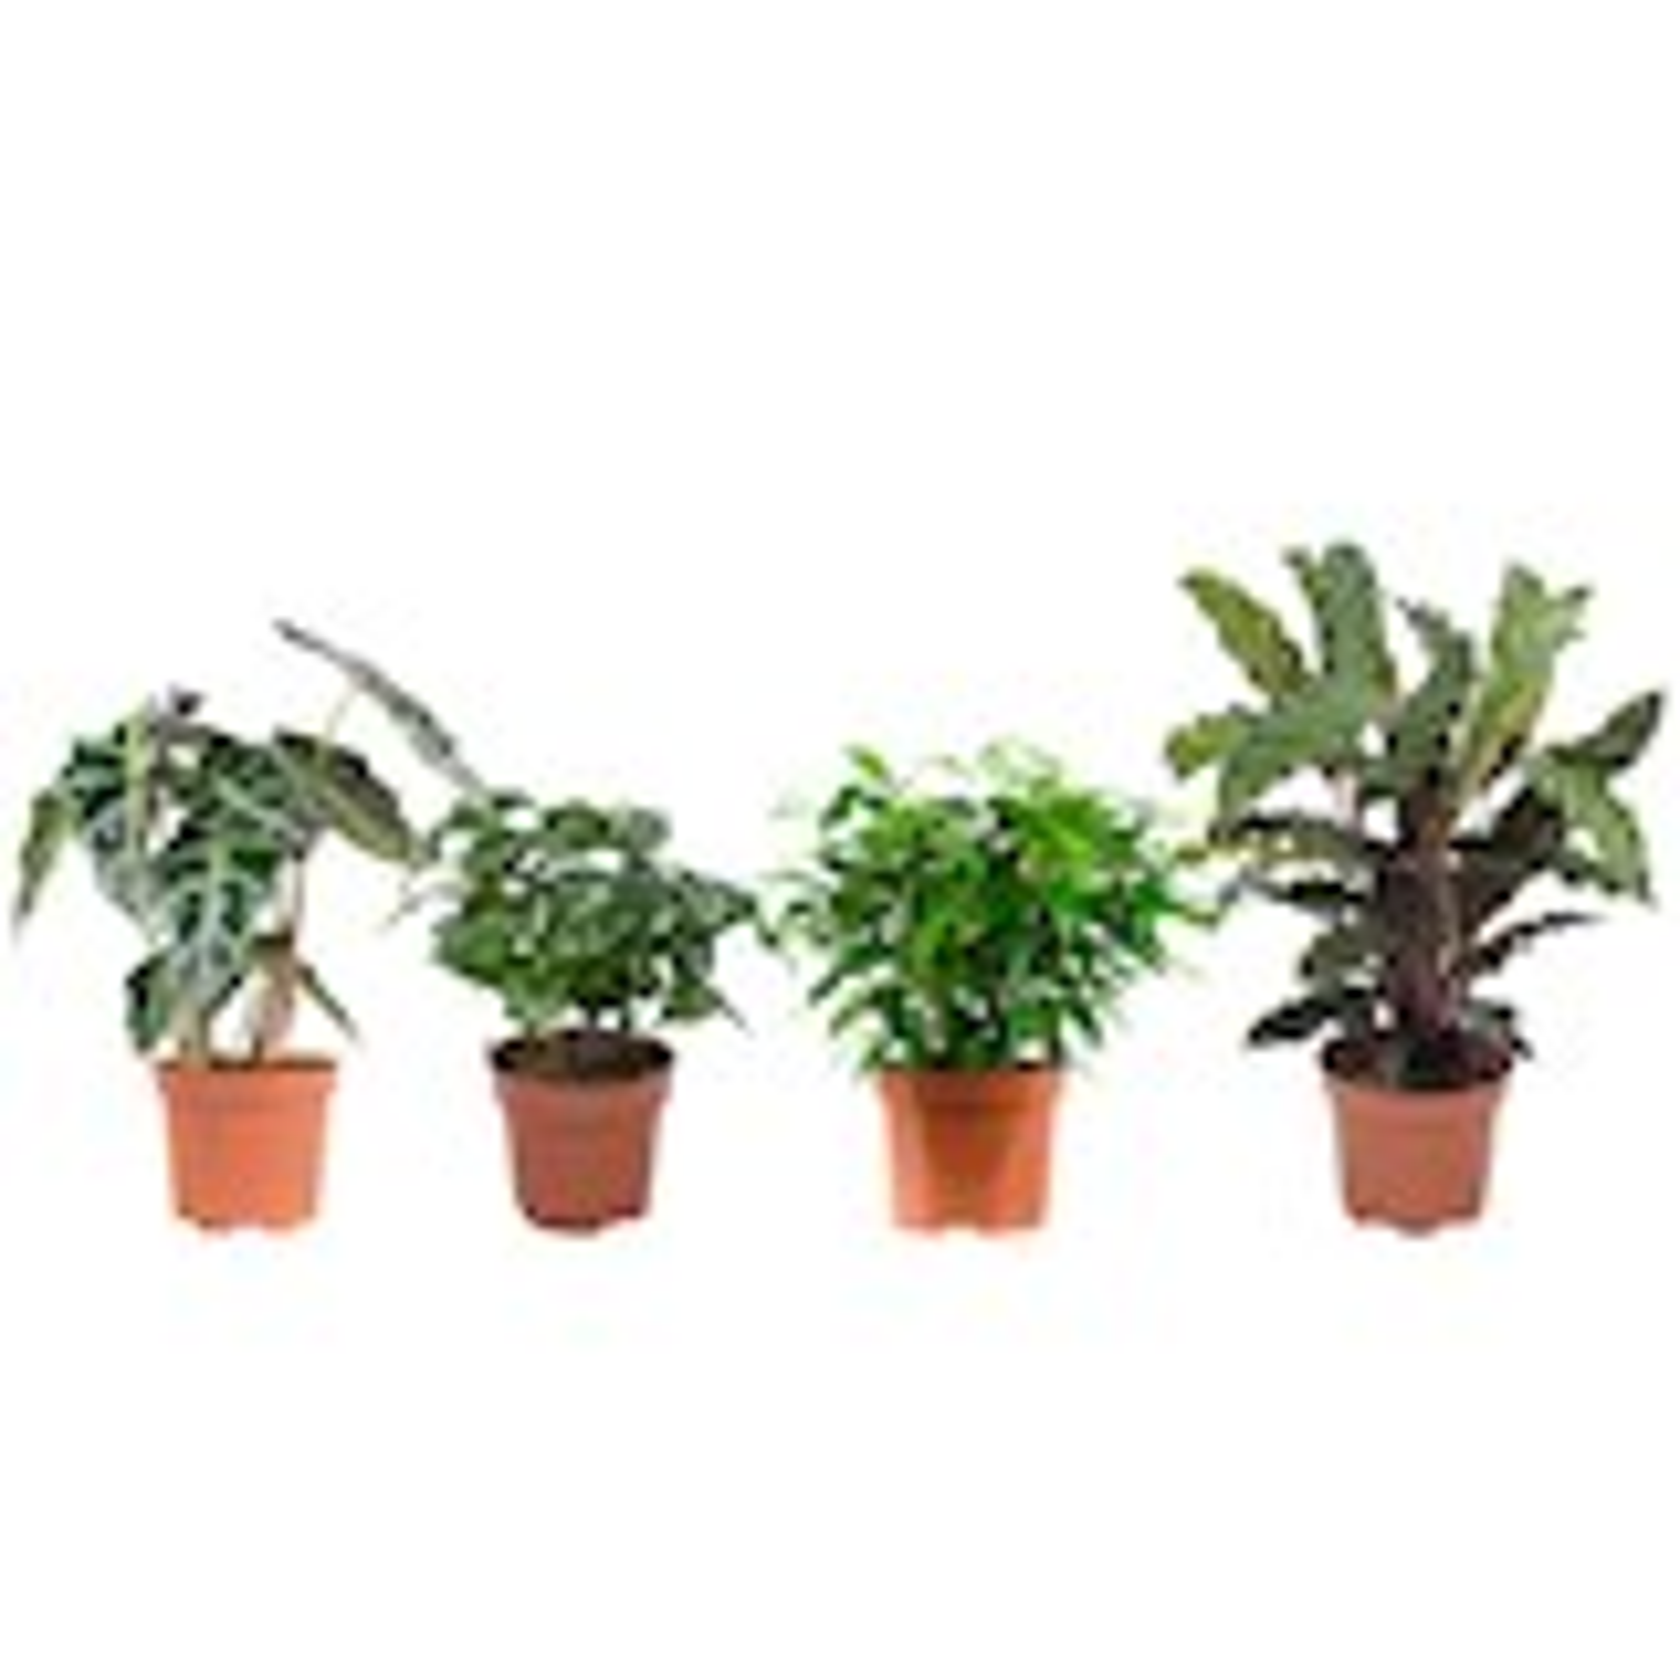 4 stuks Ficus (Ficus Green Kinky), Koffieplant (Coffea Arabica), Olifantsoor of Skeletplant (Alocasia Polly), Calathea (Calathea Rufibarba) - pot 12cm - hoogte 25cm